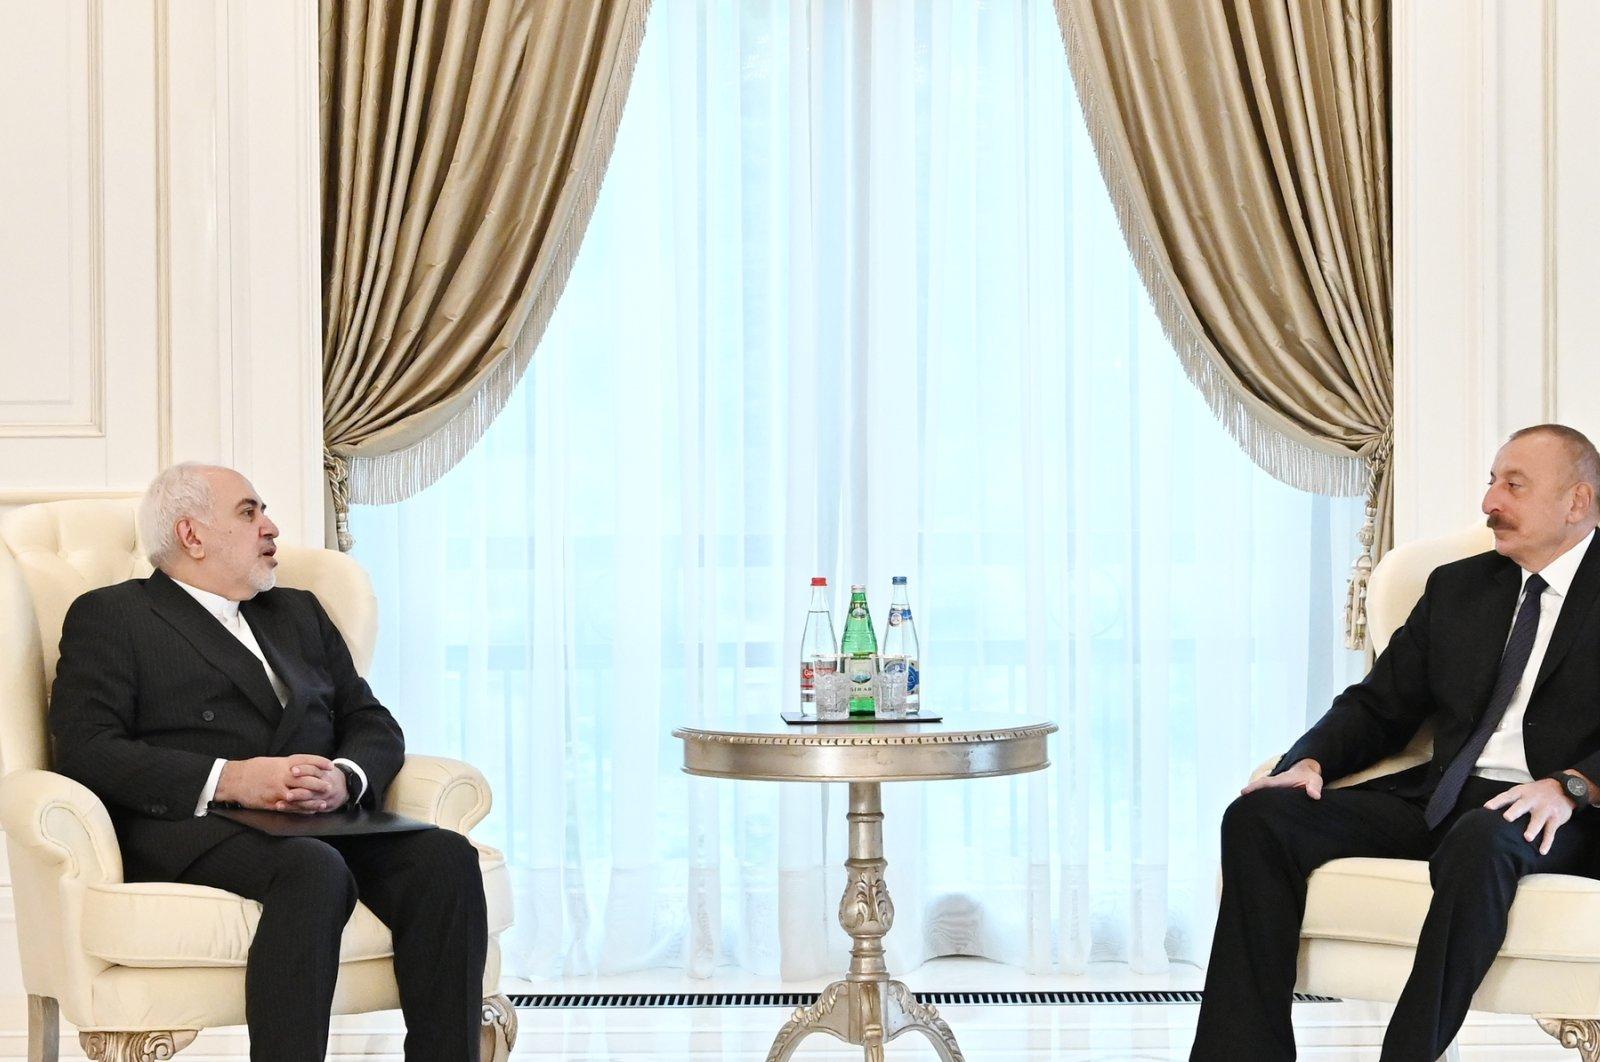 Azerbaijani President Ilham Aliyev (R) receives Iranian Foreign Minister Javad Zarif (L) in Baku, Azerbaijan, May 25, 2021. (AA Photo)